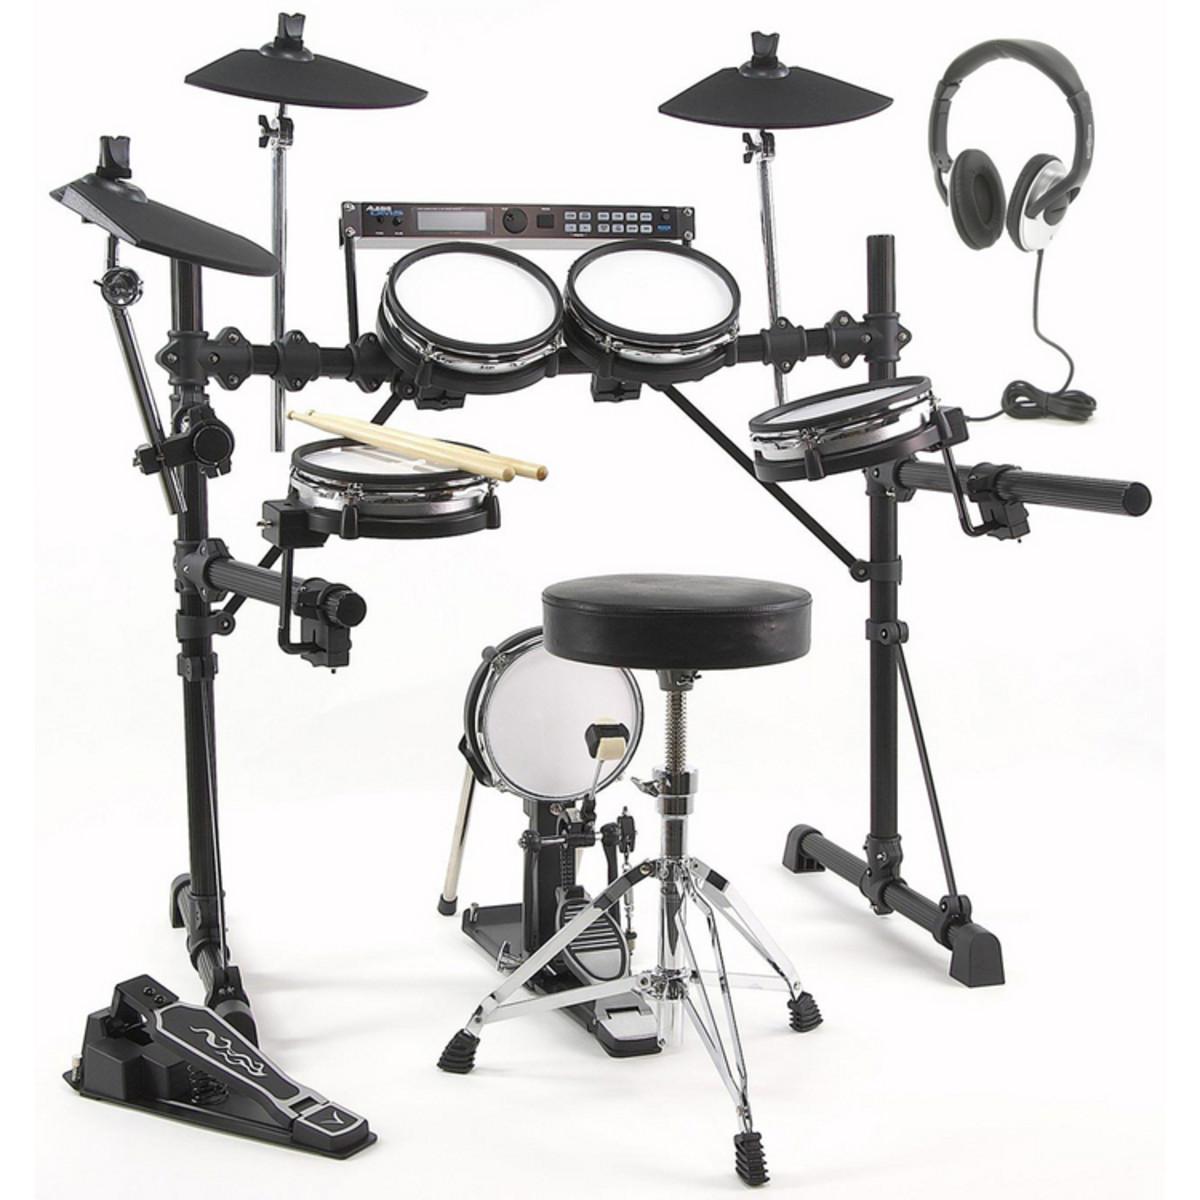 discontinued alesis dm5 pro drum kit package deal at. Black Bedroom Furniture Sets. Home Design Ideas